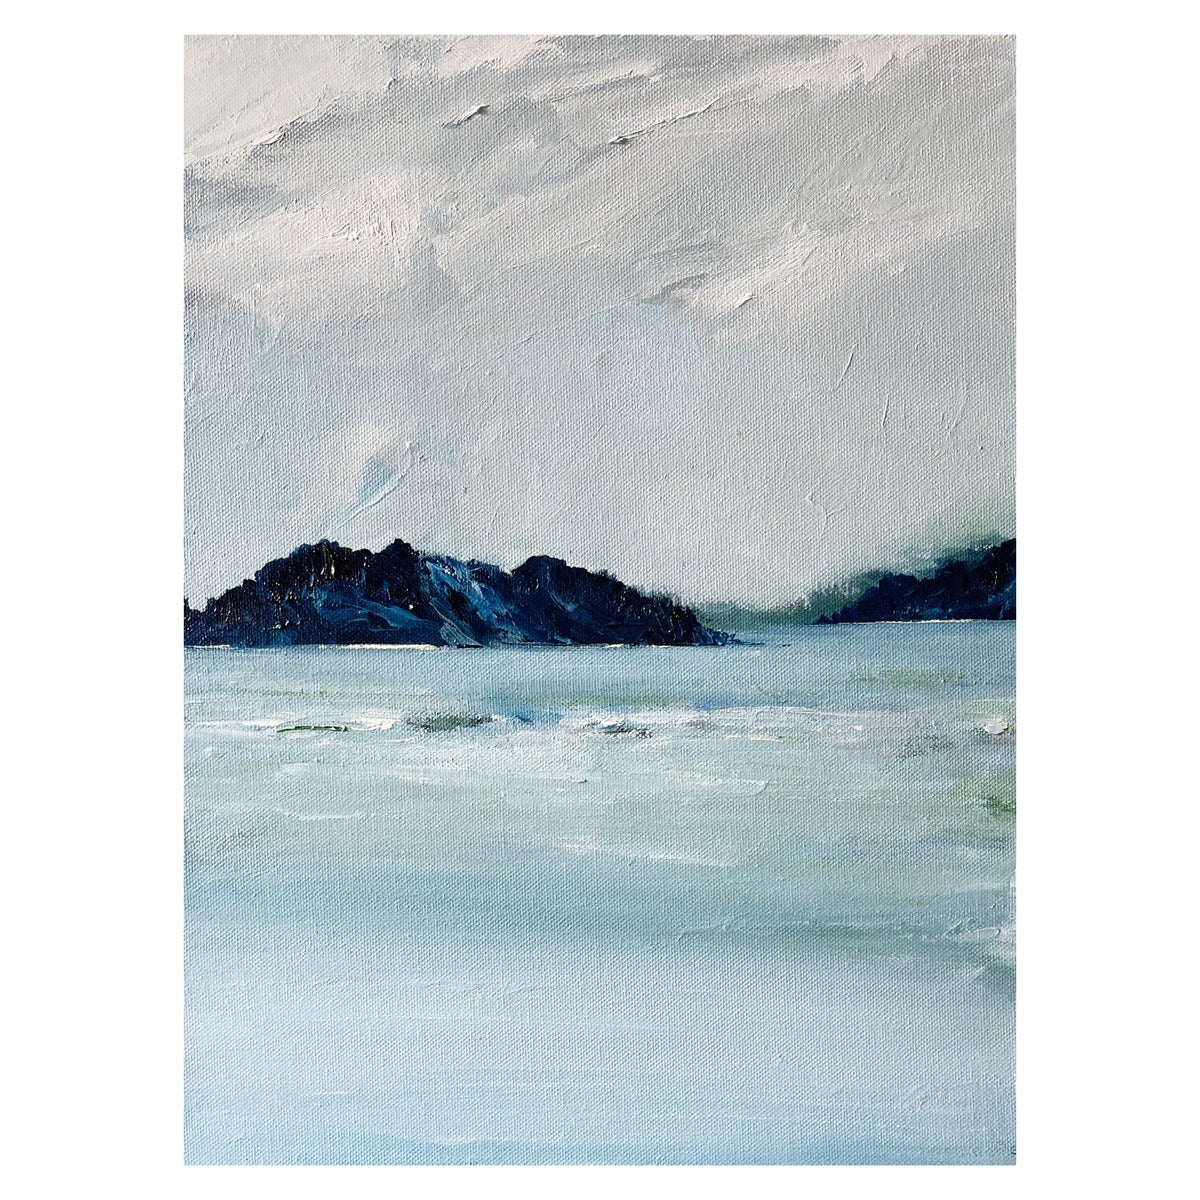 Image of 'Sandy Island' 2021 Oil on Canvas